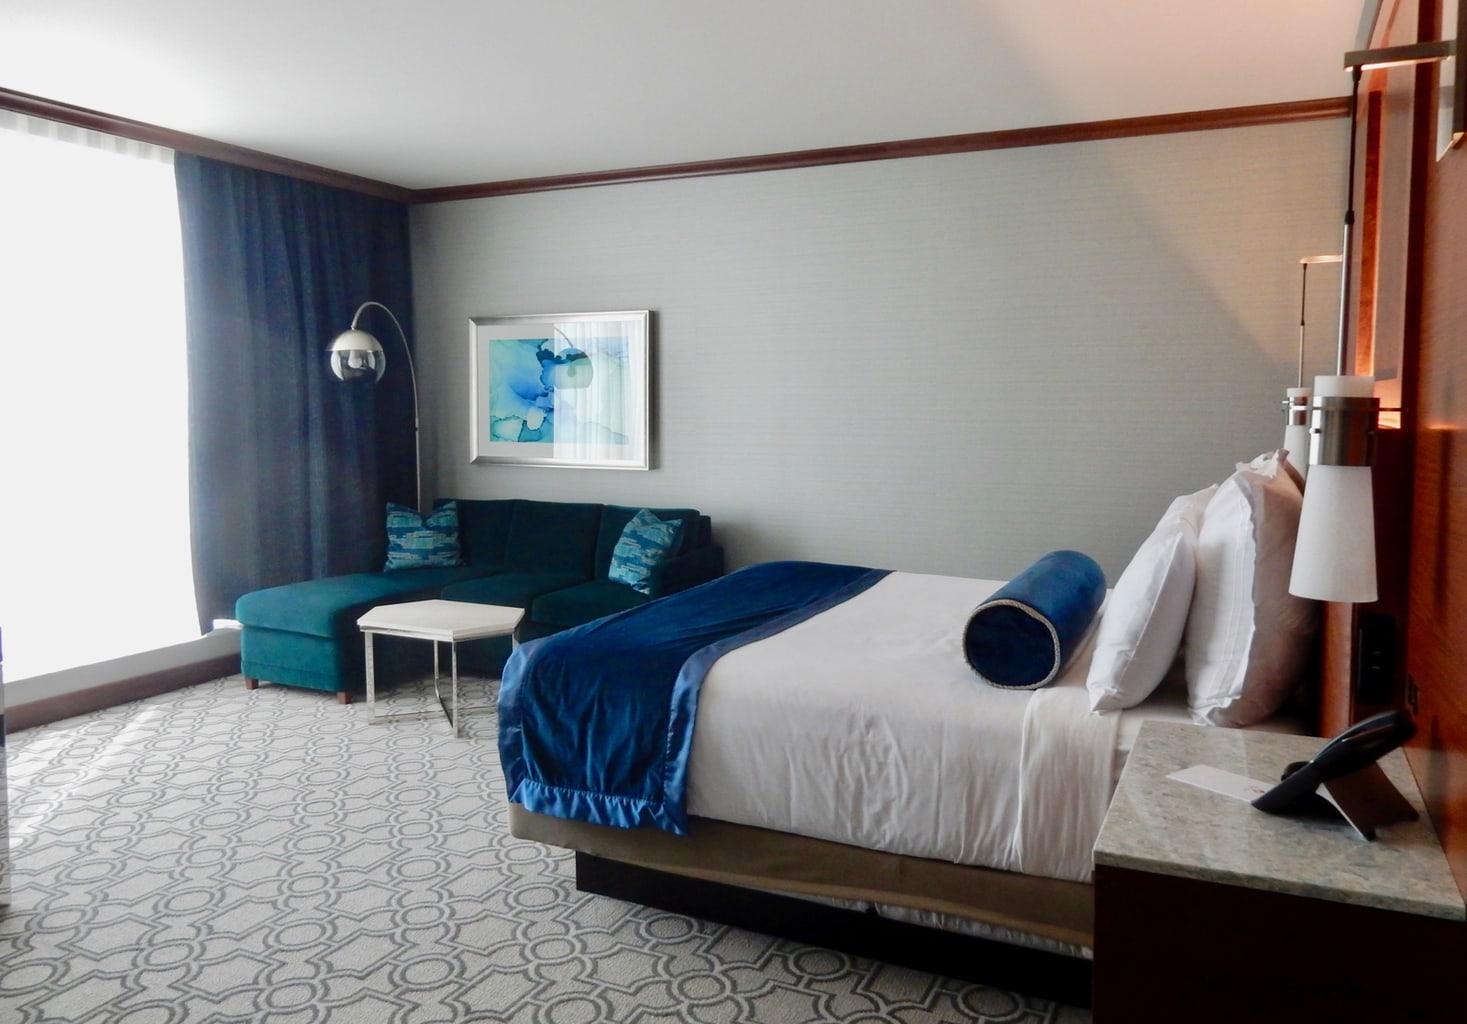 Resorts World Catskills Monticello Ny Betting Off